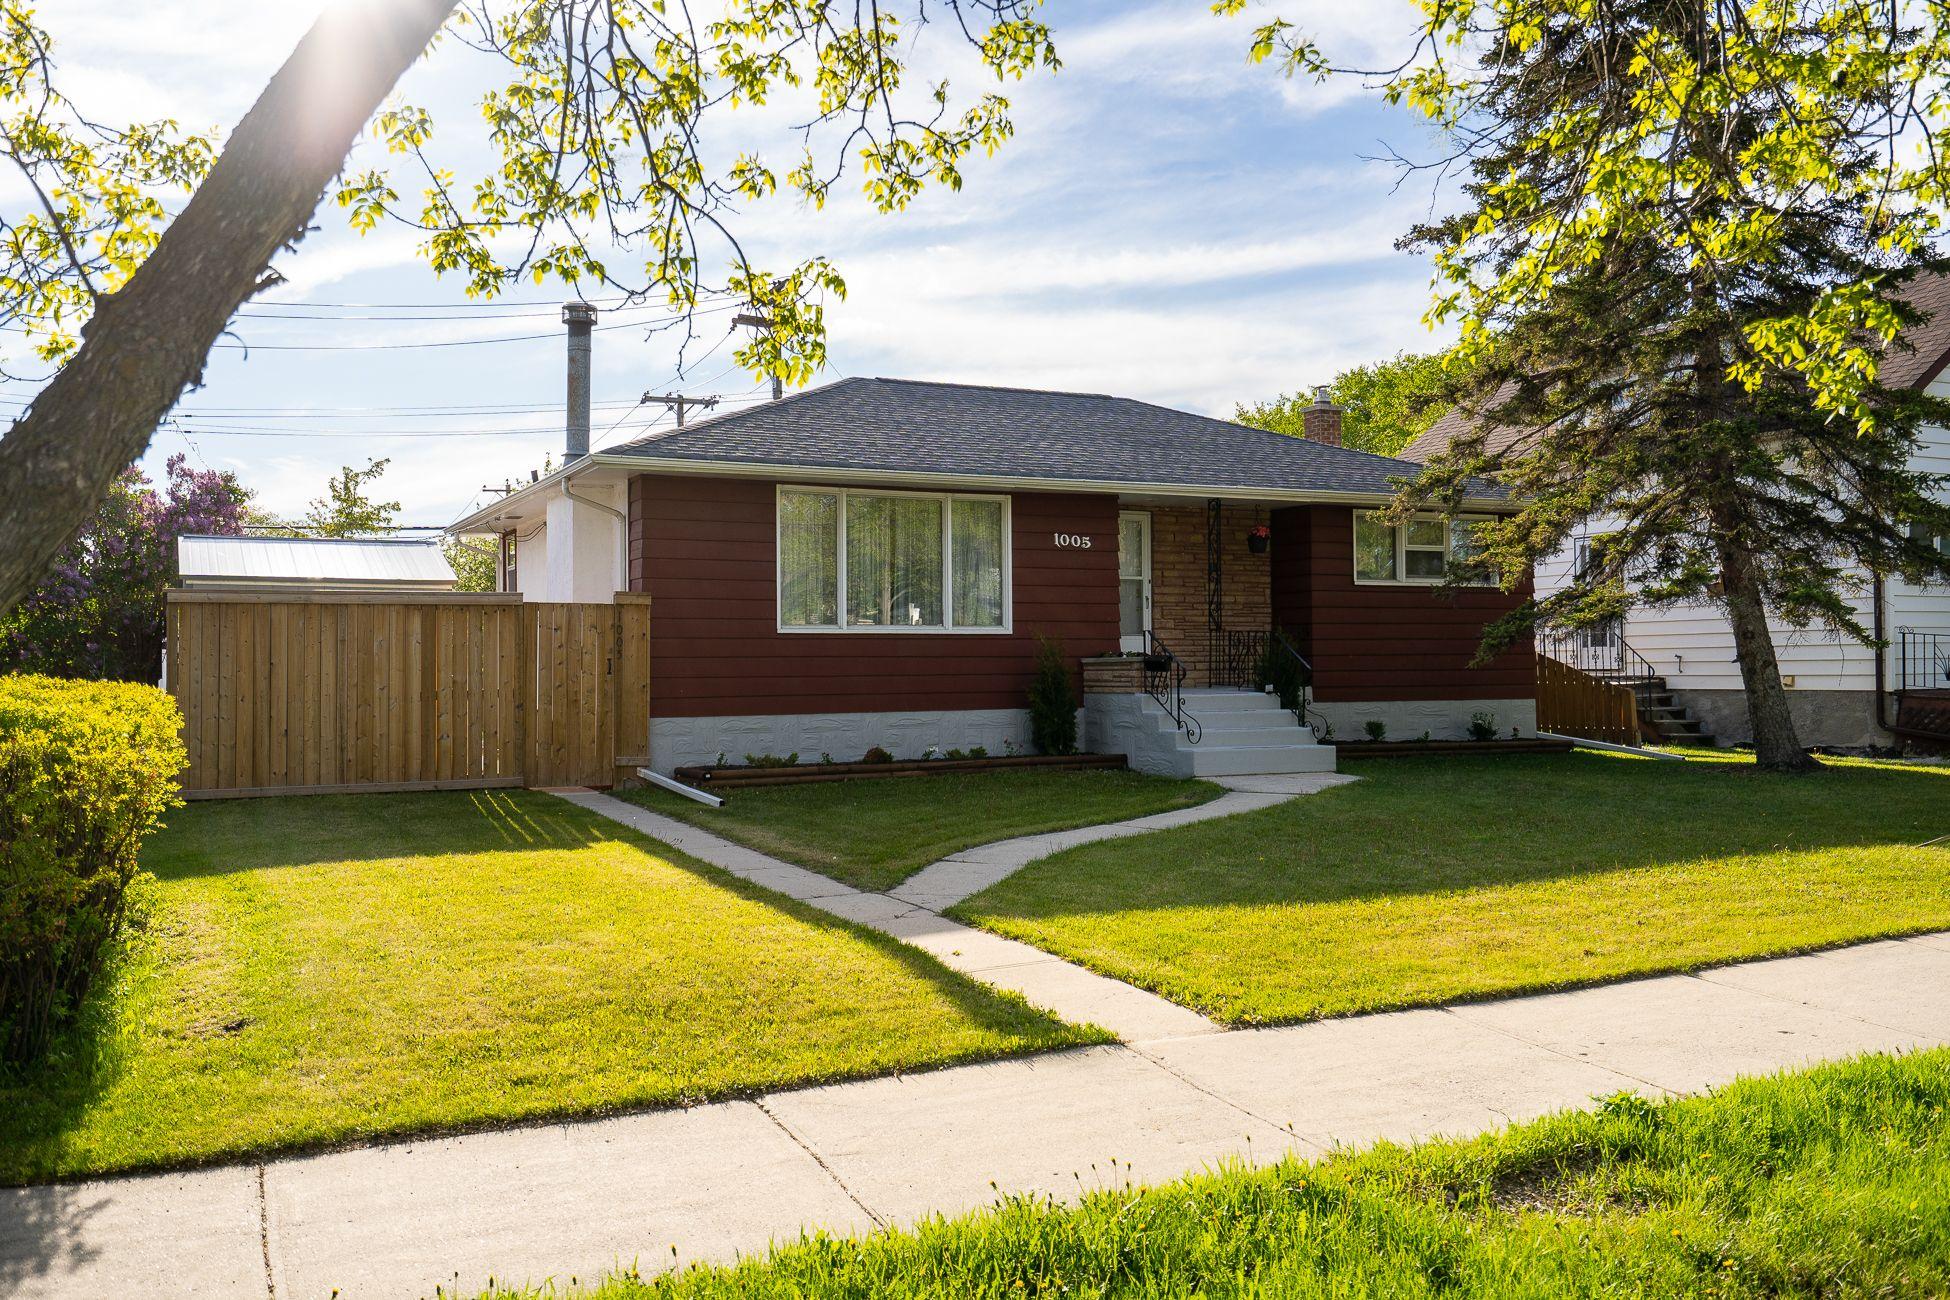 Main Photo: 1005 Day Street in Winnipeg: West Transcona House for sale (3L)  : MLS®# 202113009